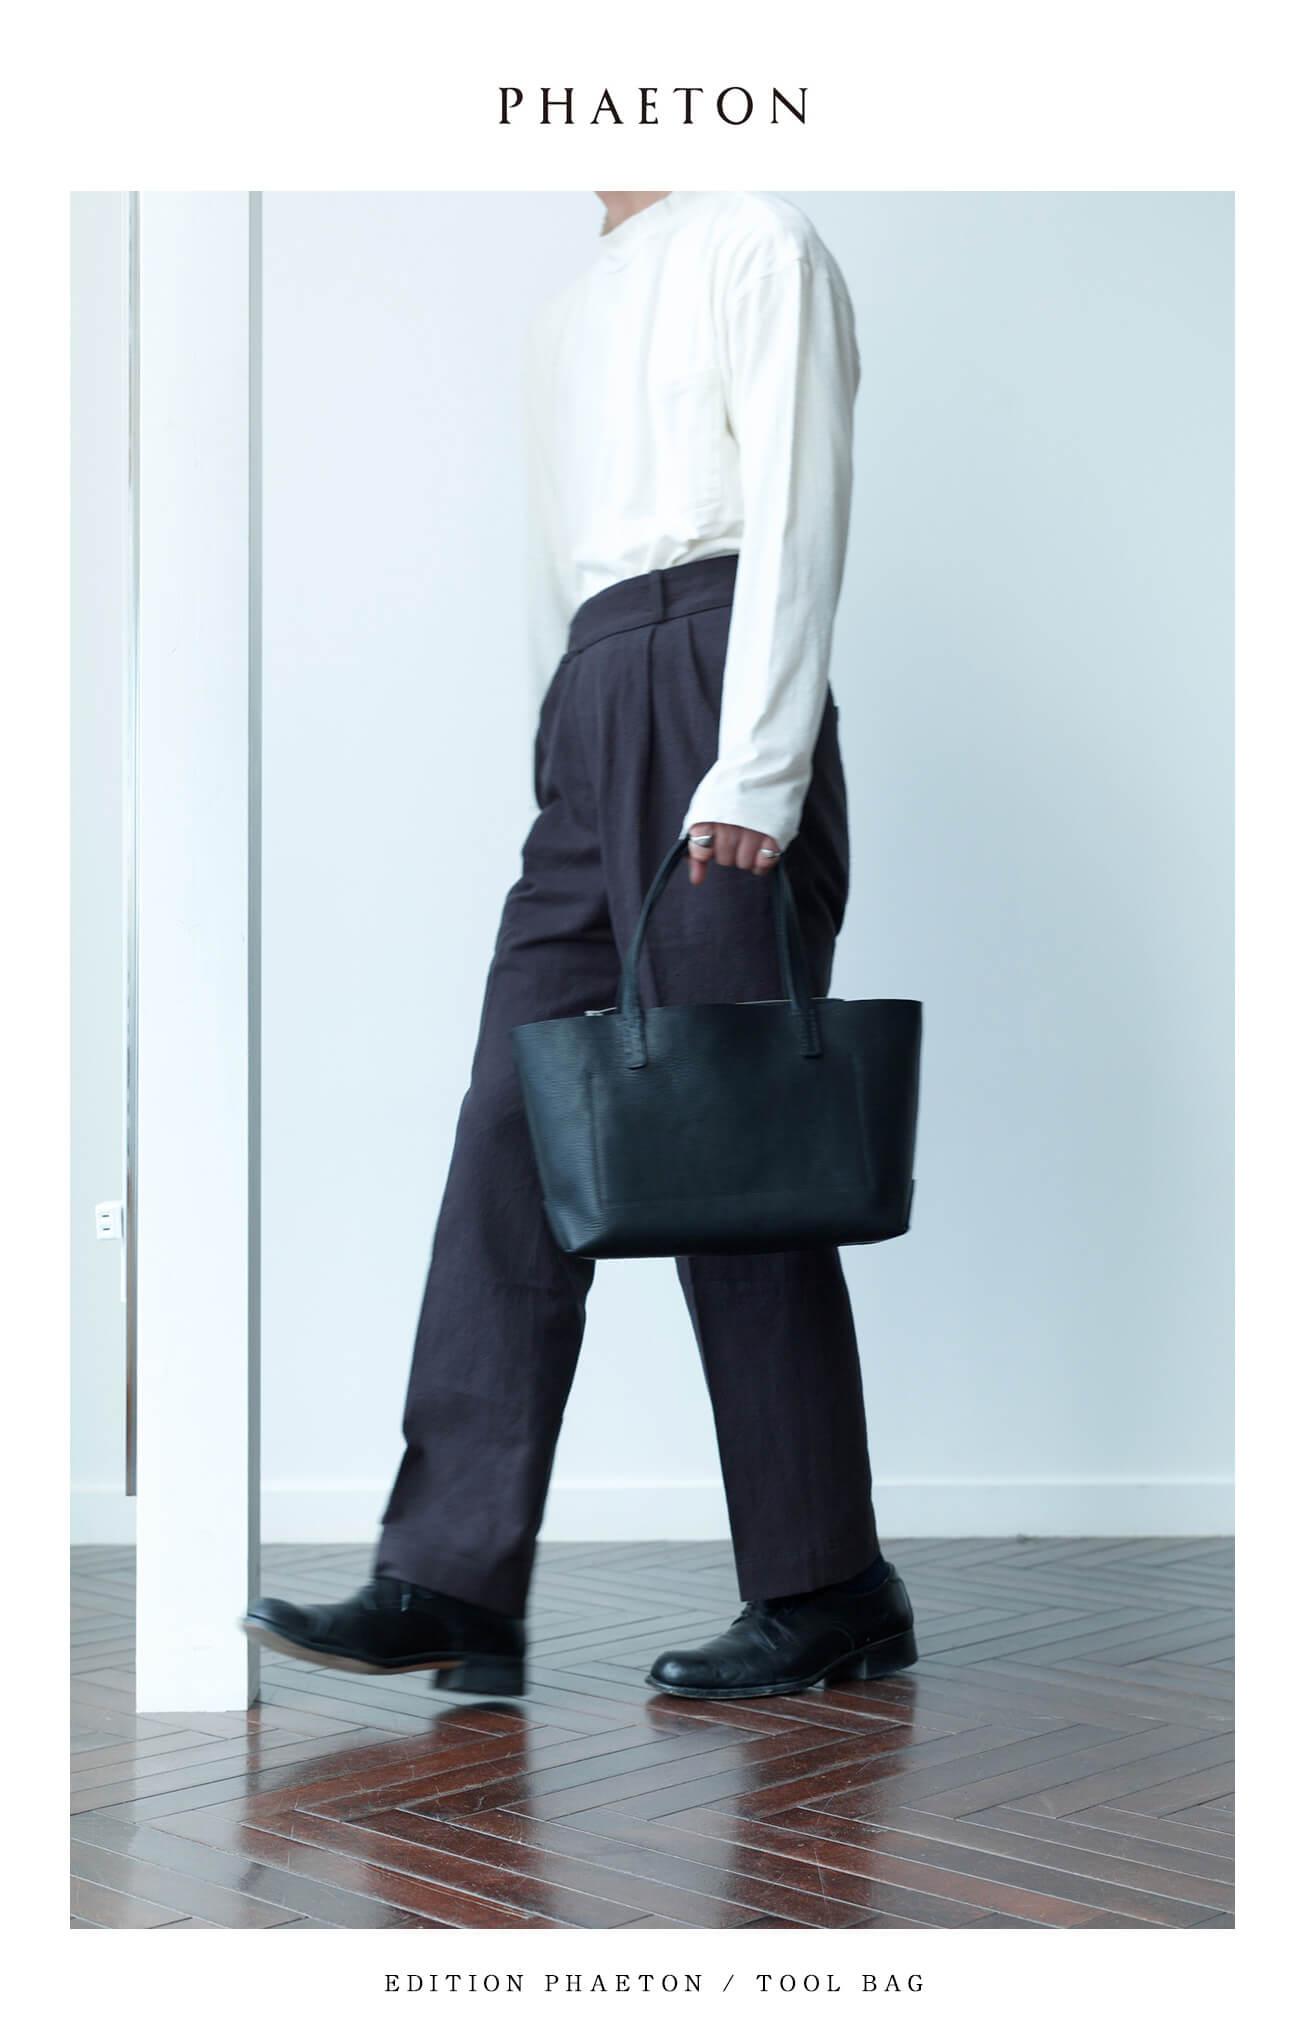 editionphaeton-toolbag05